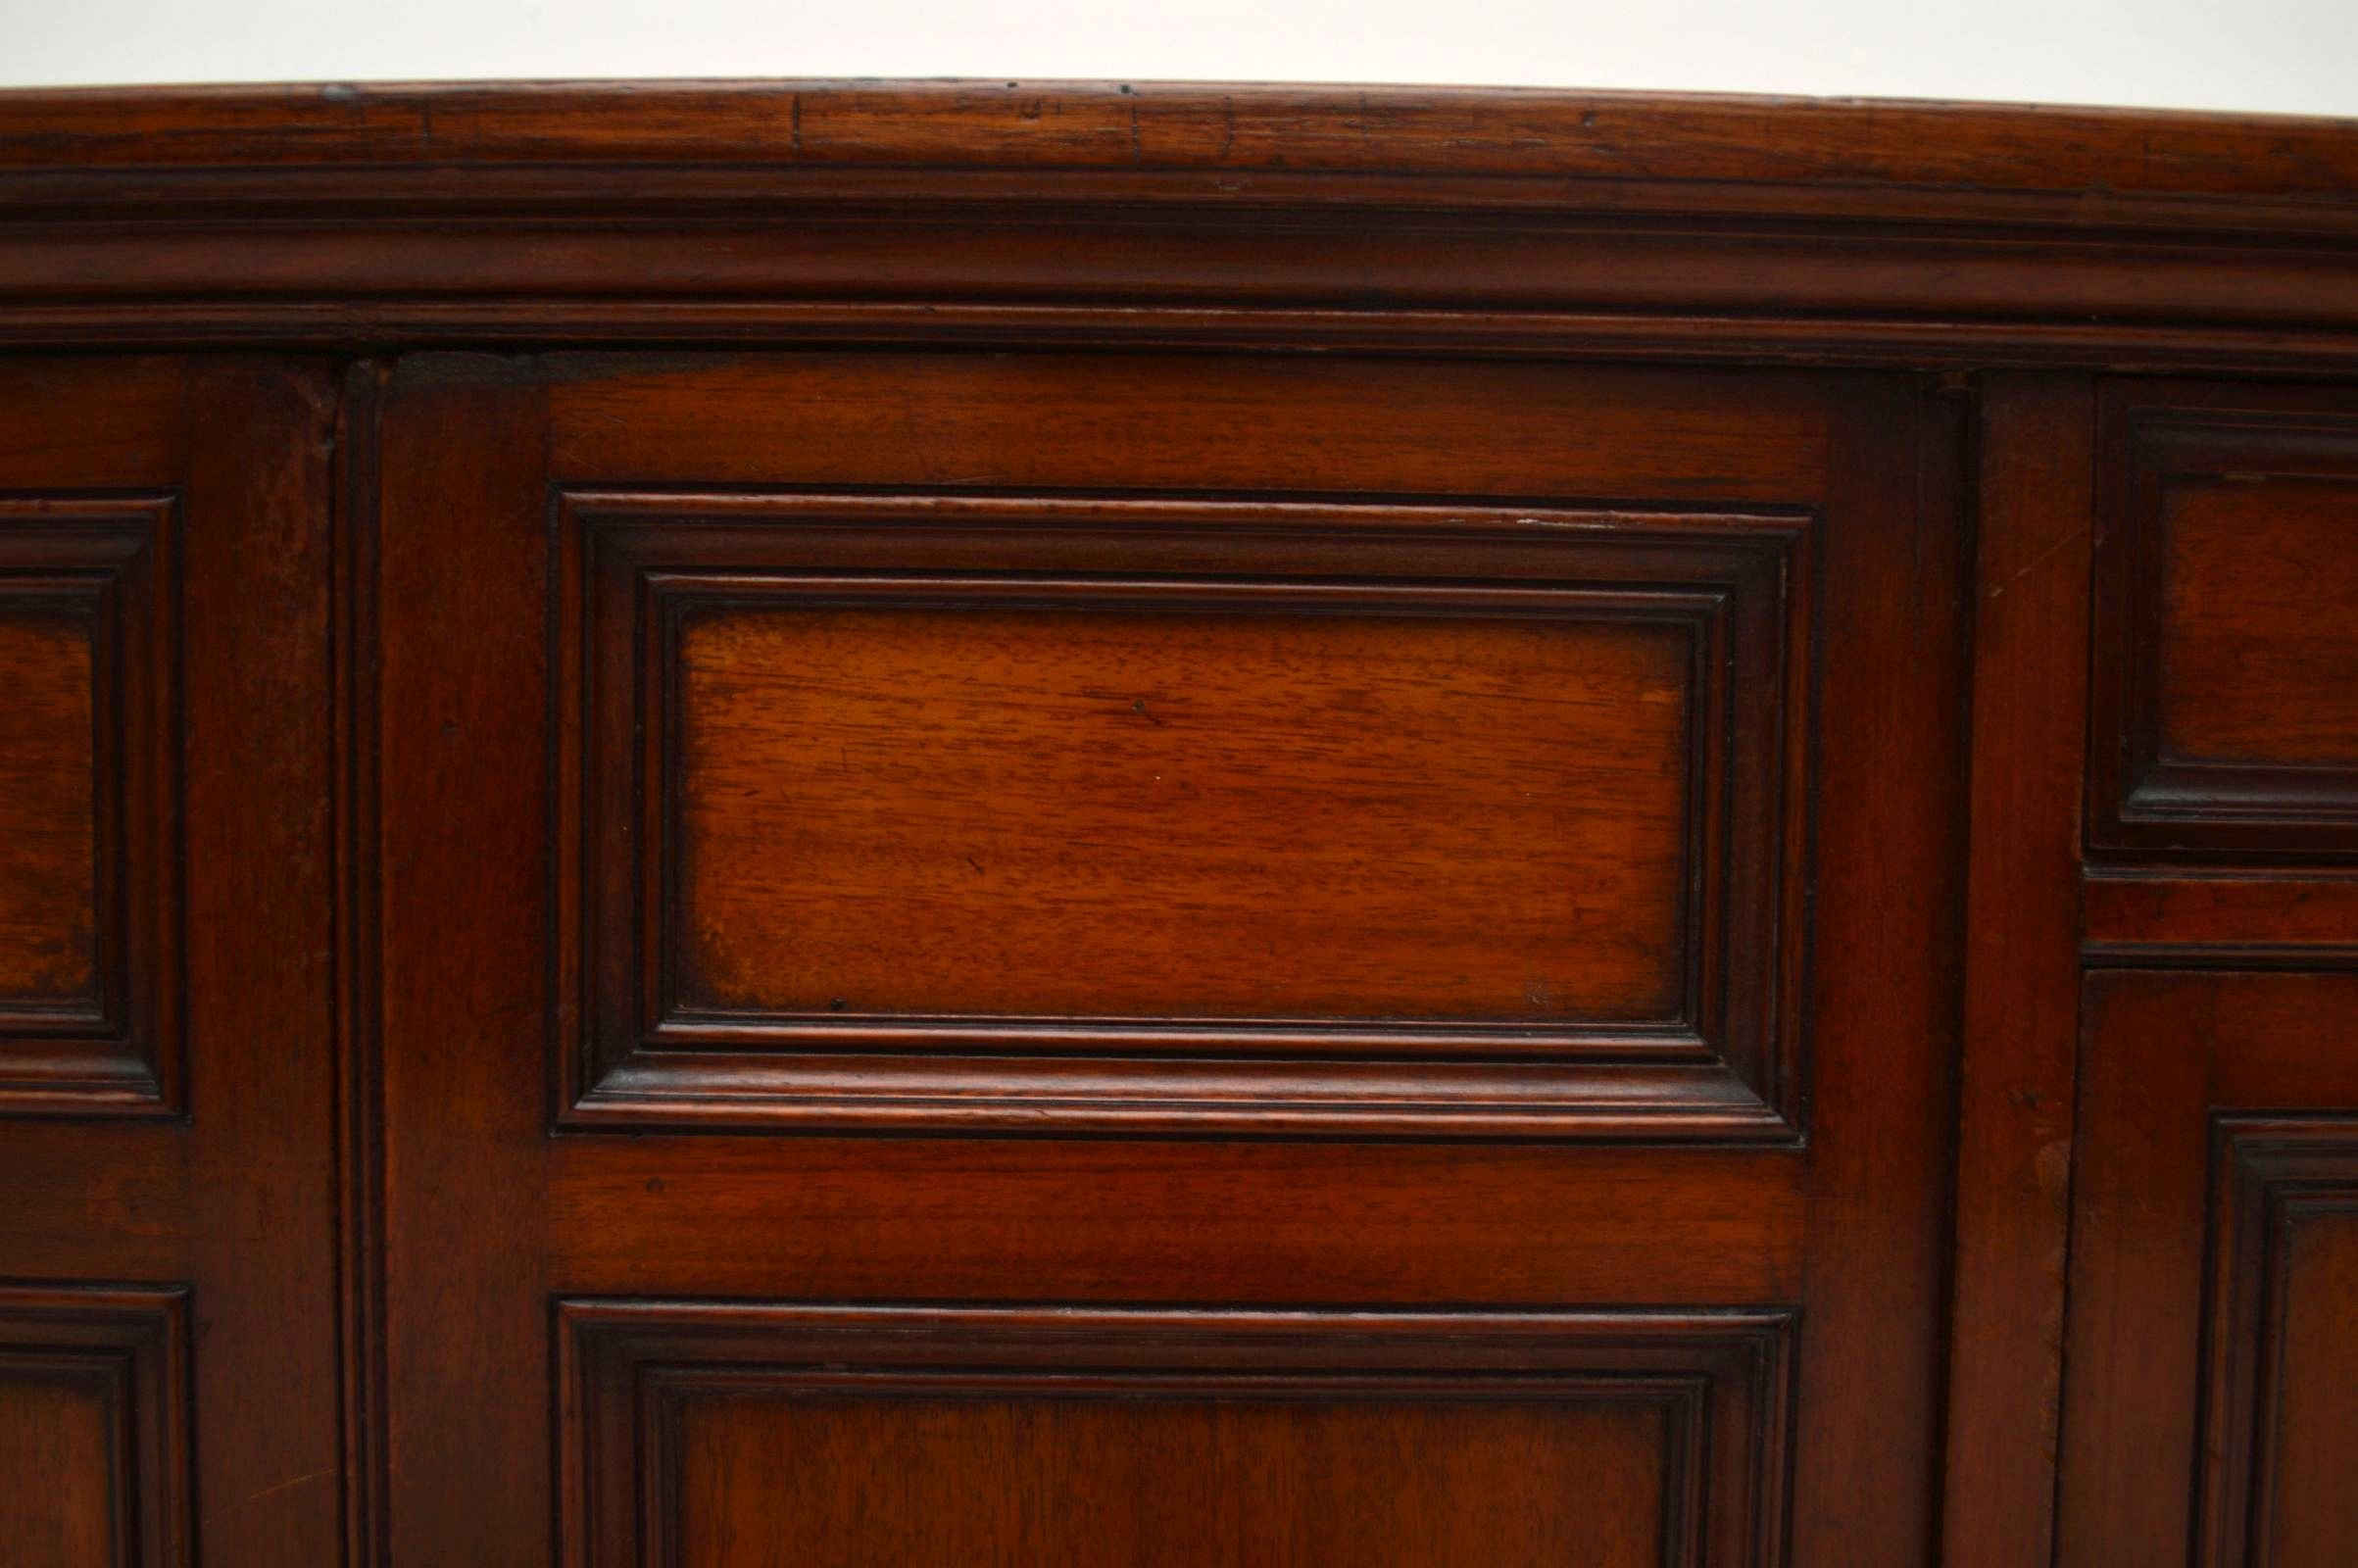 Antiker viktorianischer mahagoni schrank anrichte for Anrichte mahagoni